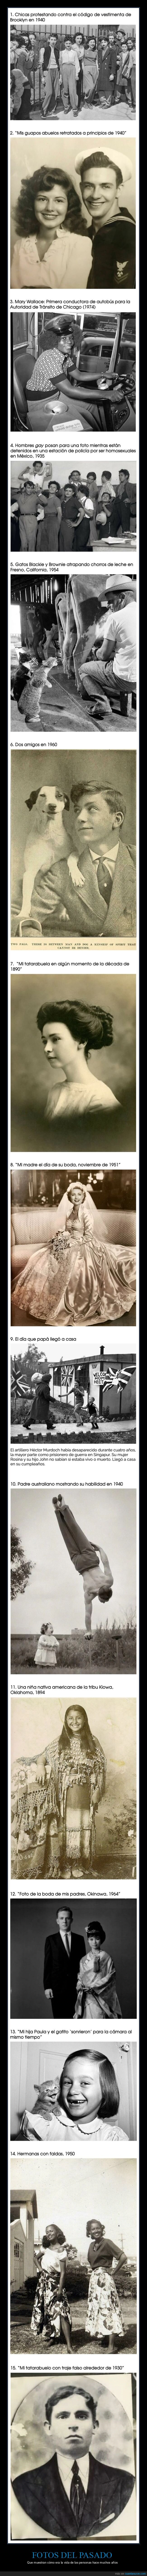 fotos,pasado,retro